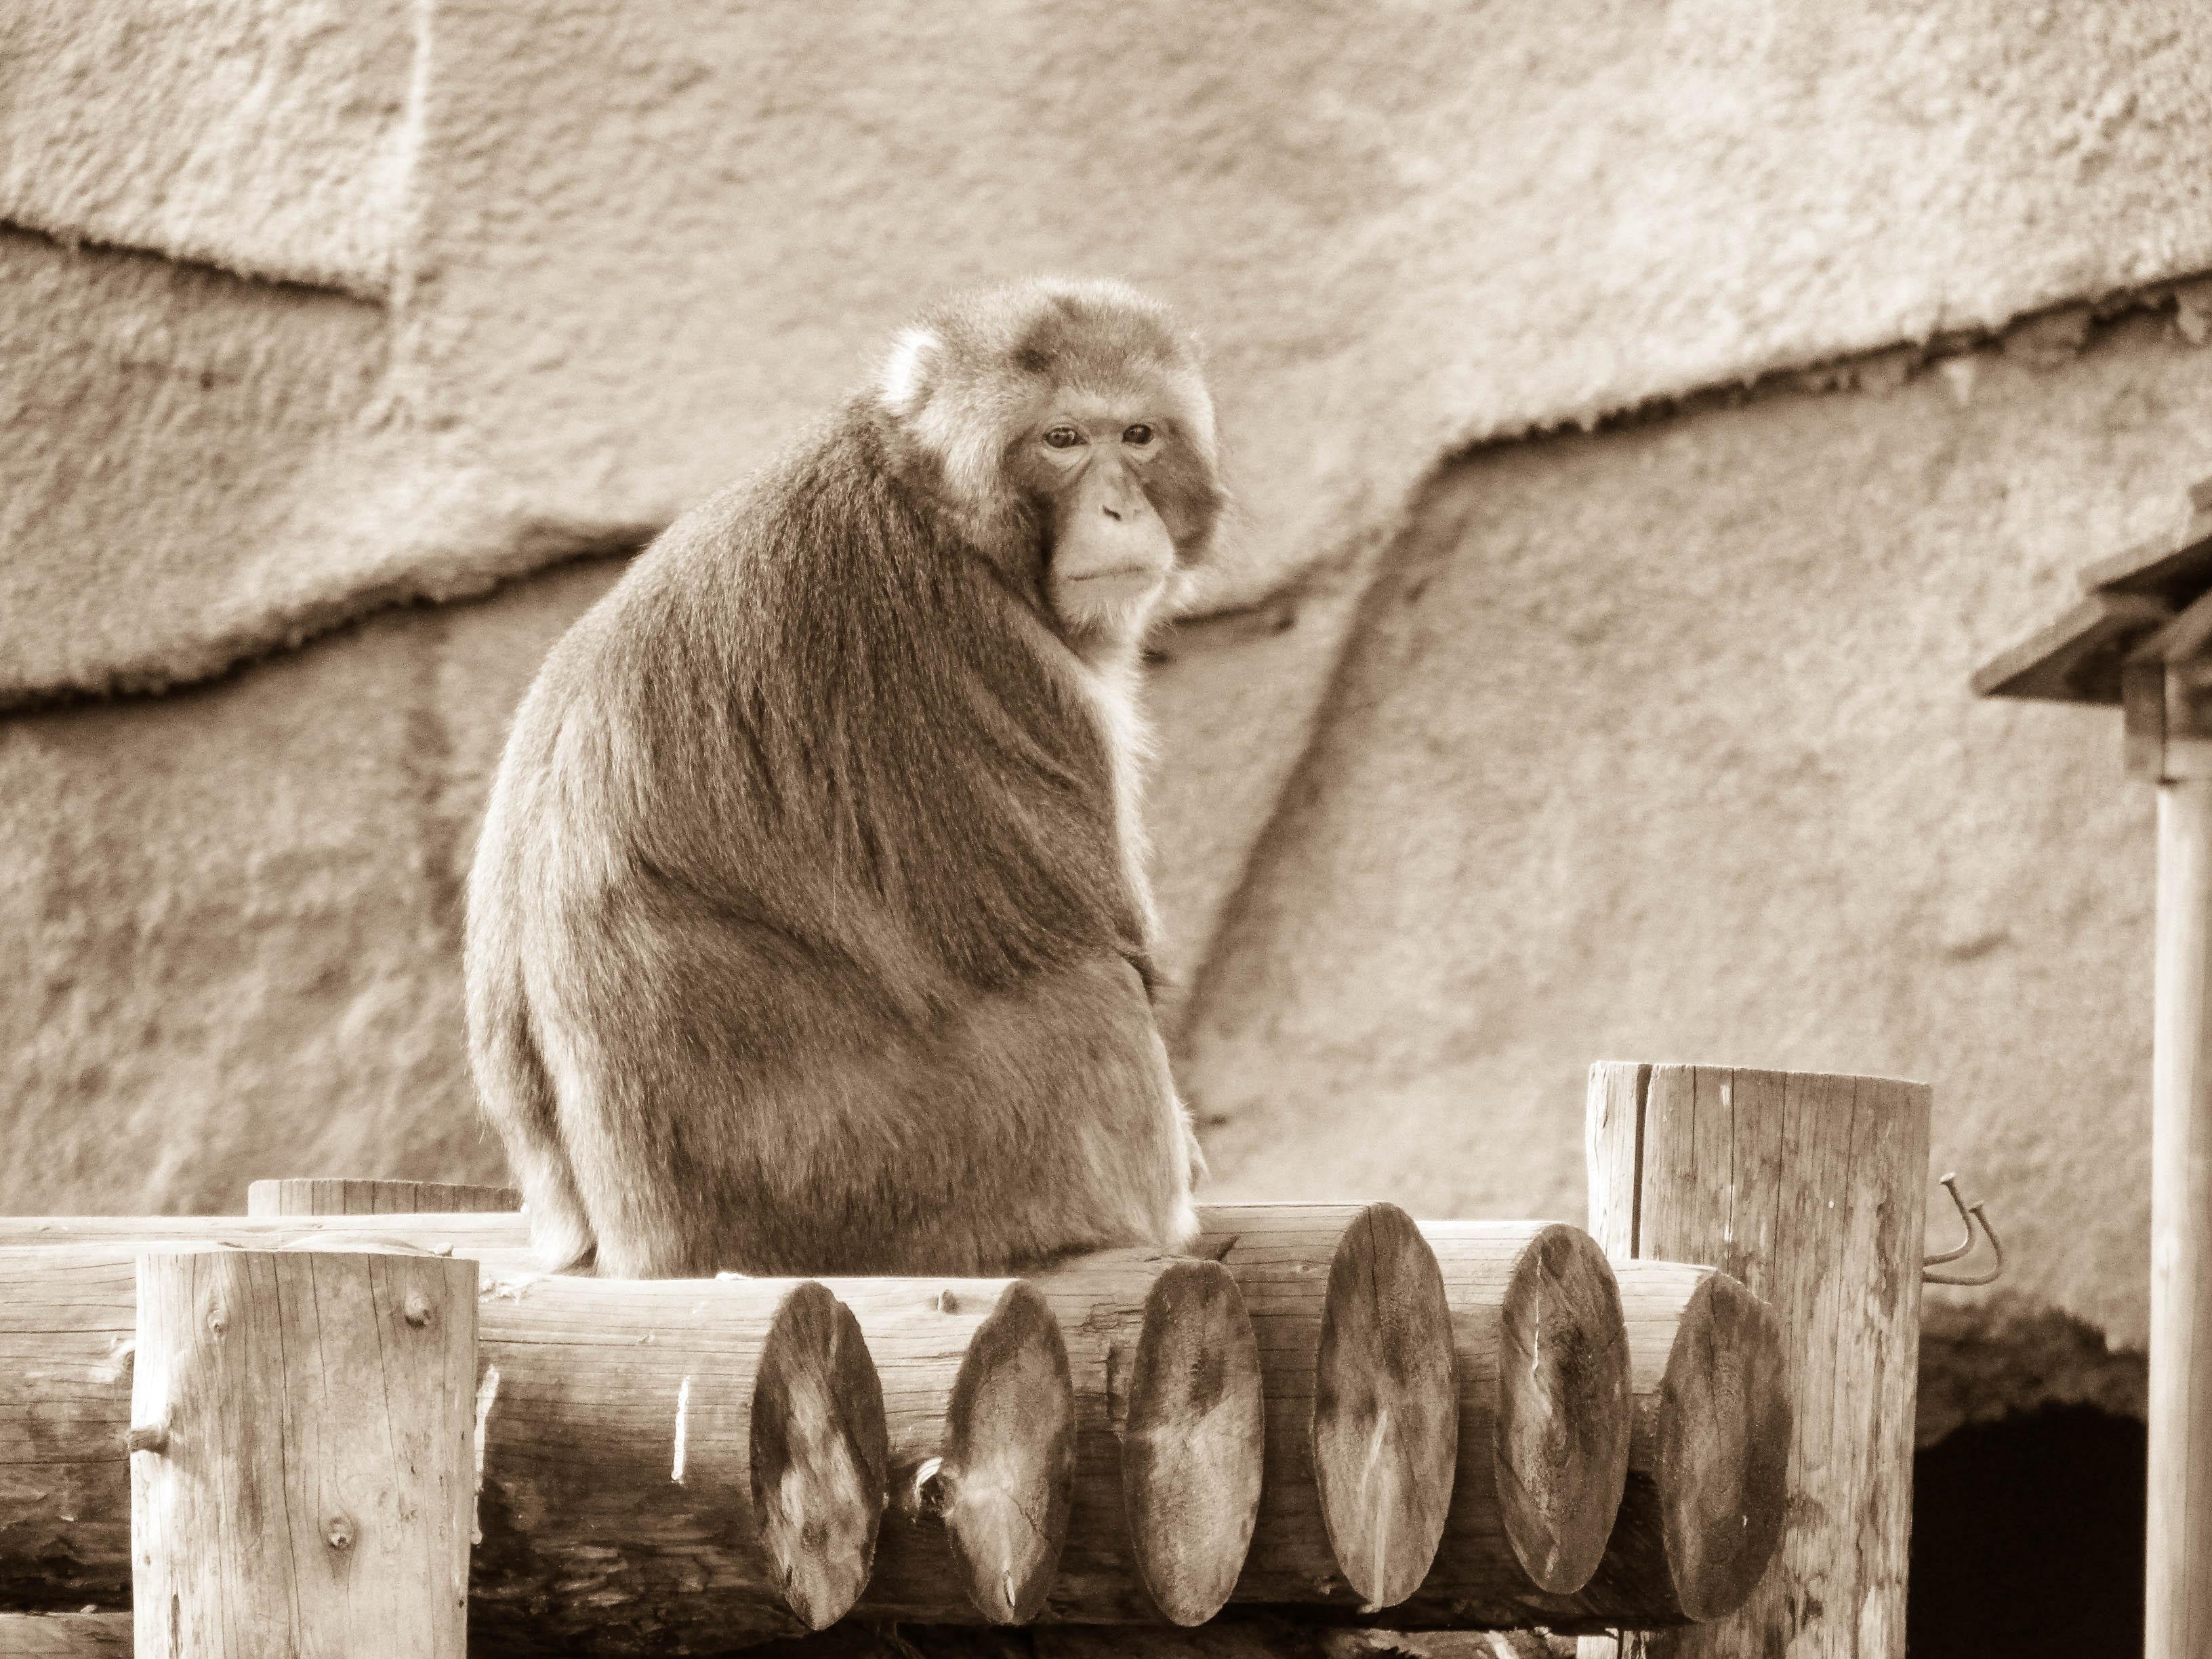 Russian Monkey, Ape, Monkey, Primate, Russian, HQ Photo